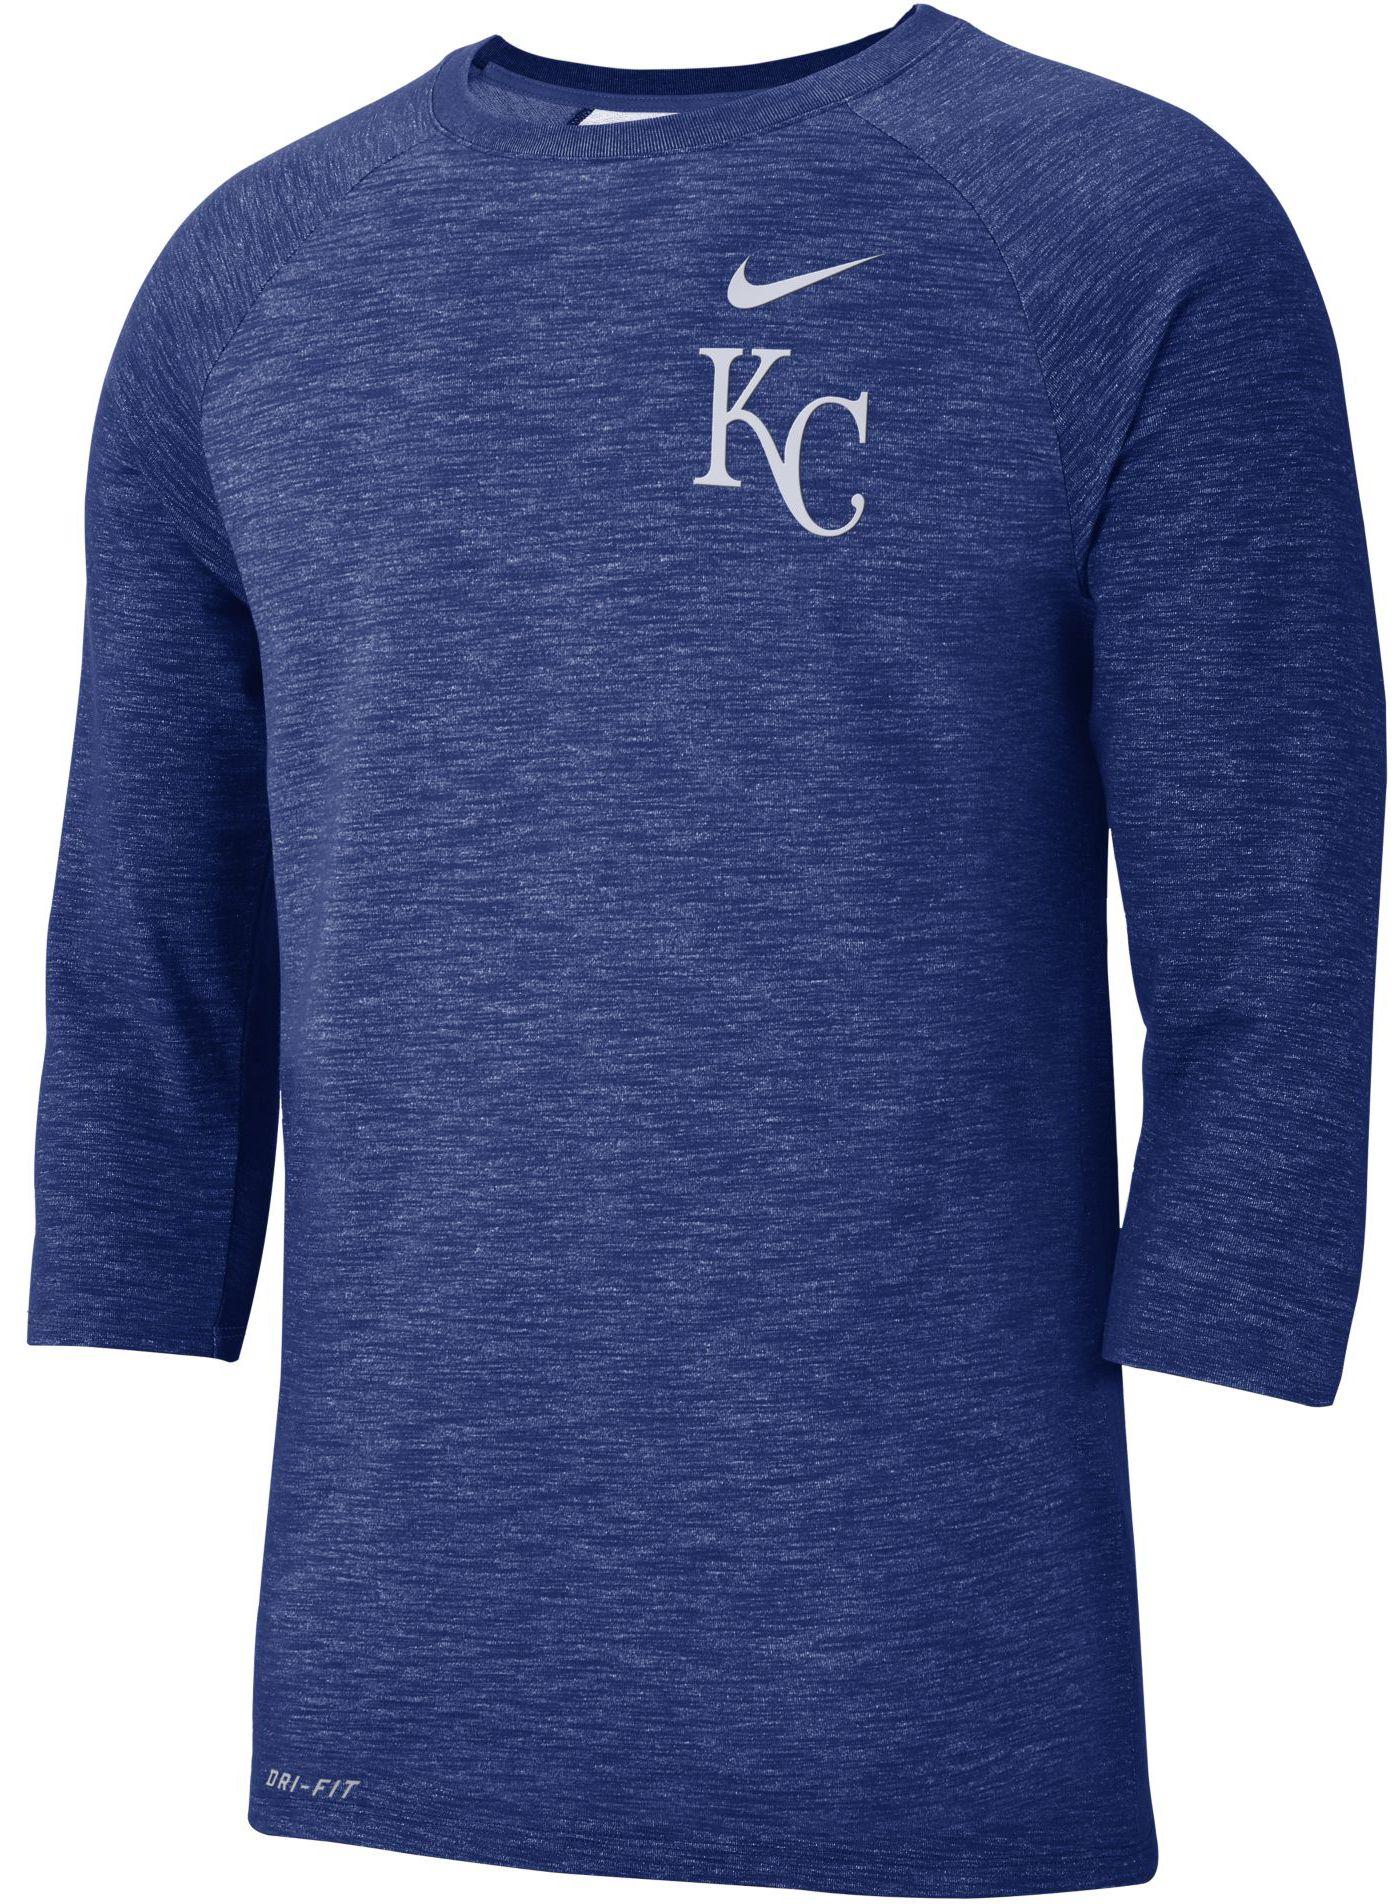 Nike Men's Kansas City Royals Dri-FIT Slub Three-Quarter Sleeve Shirt